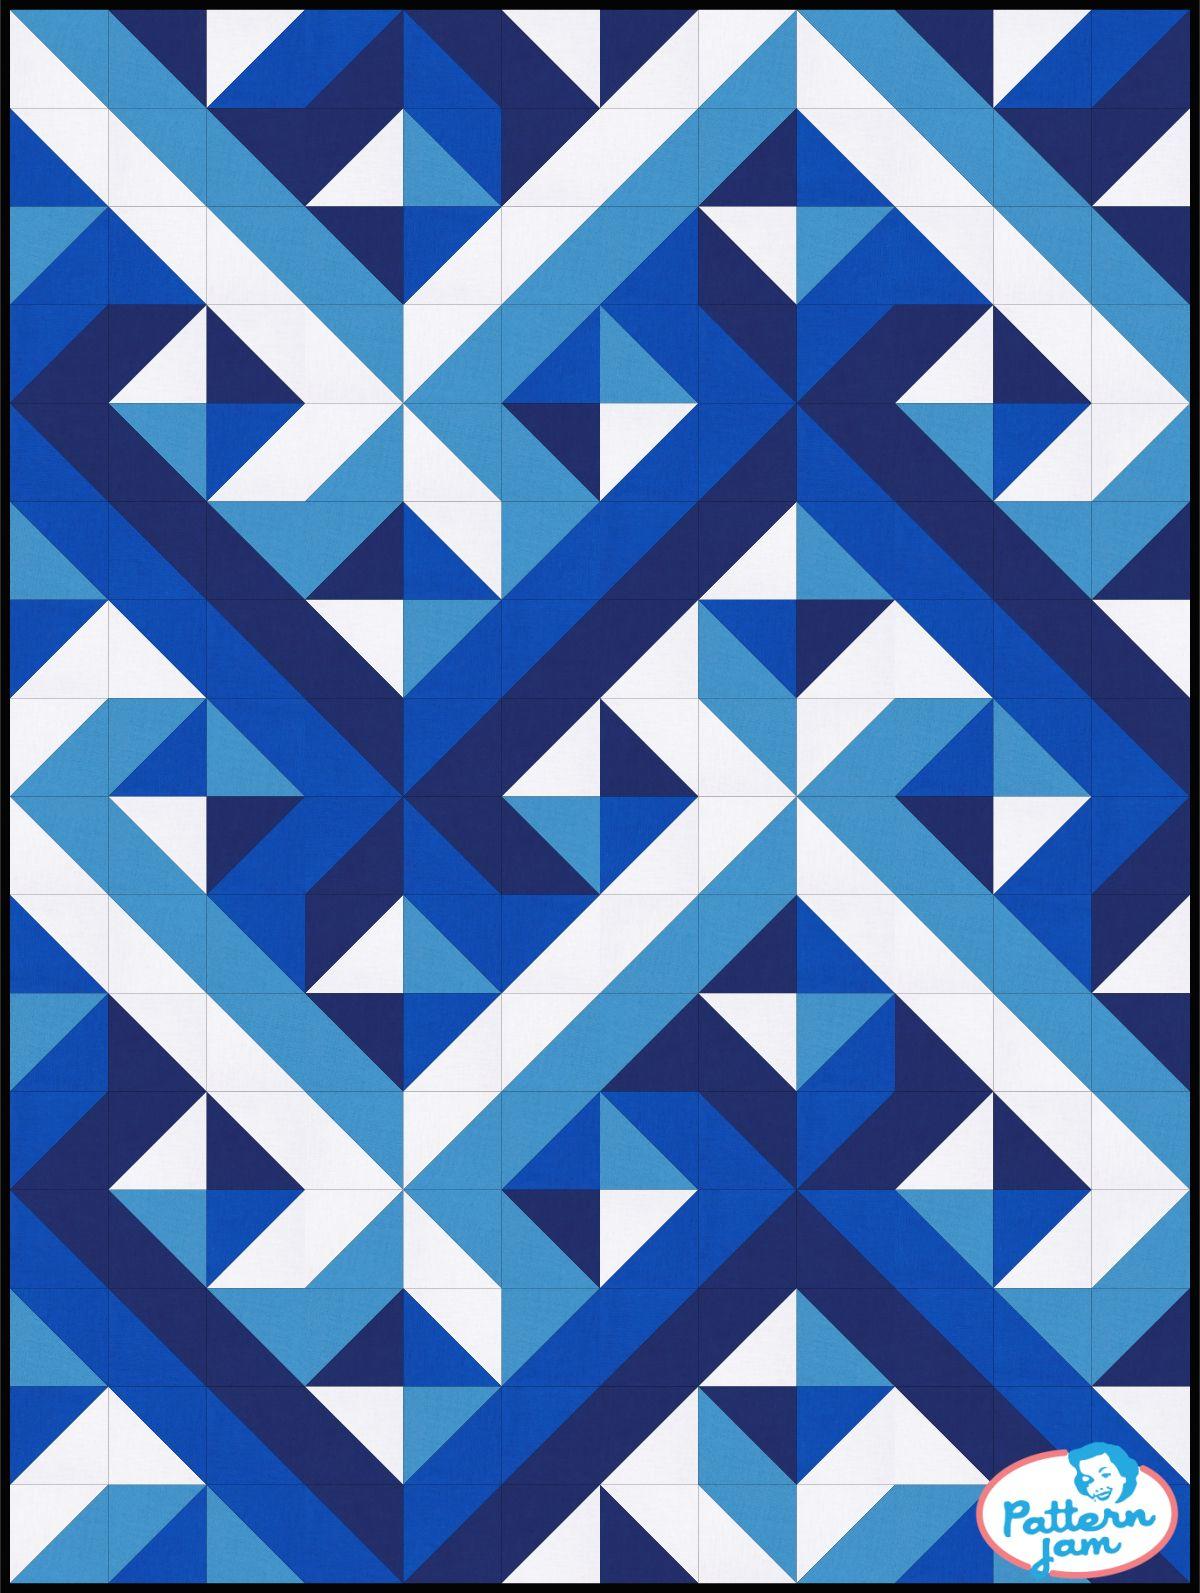 HST Interwoven Blues | quilting #2 | Pinterest | Edredones, Patrones ...